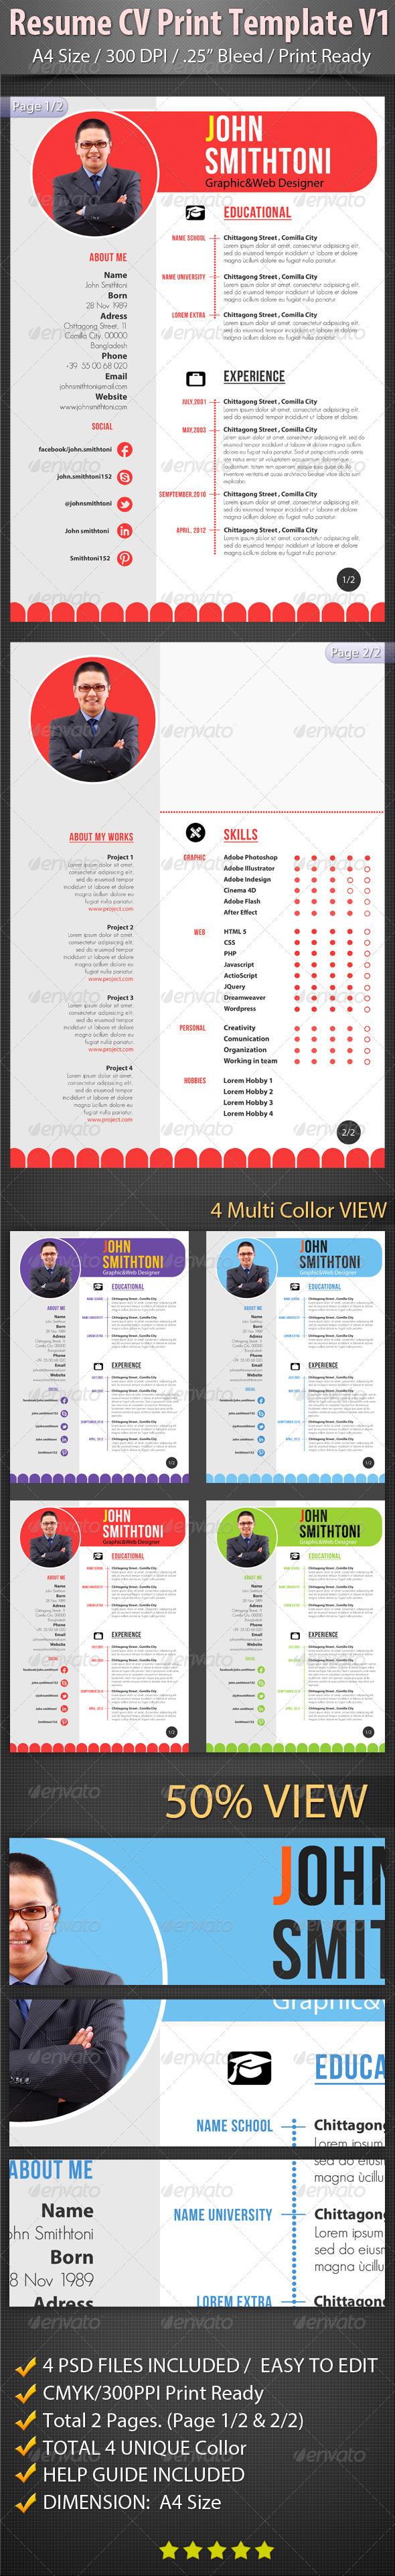 Resume CV Print Template V1